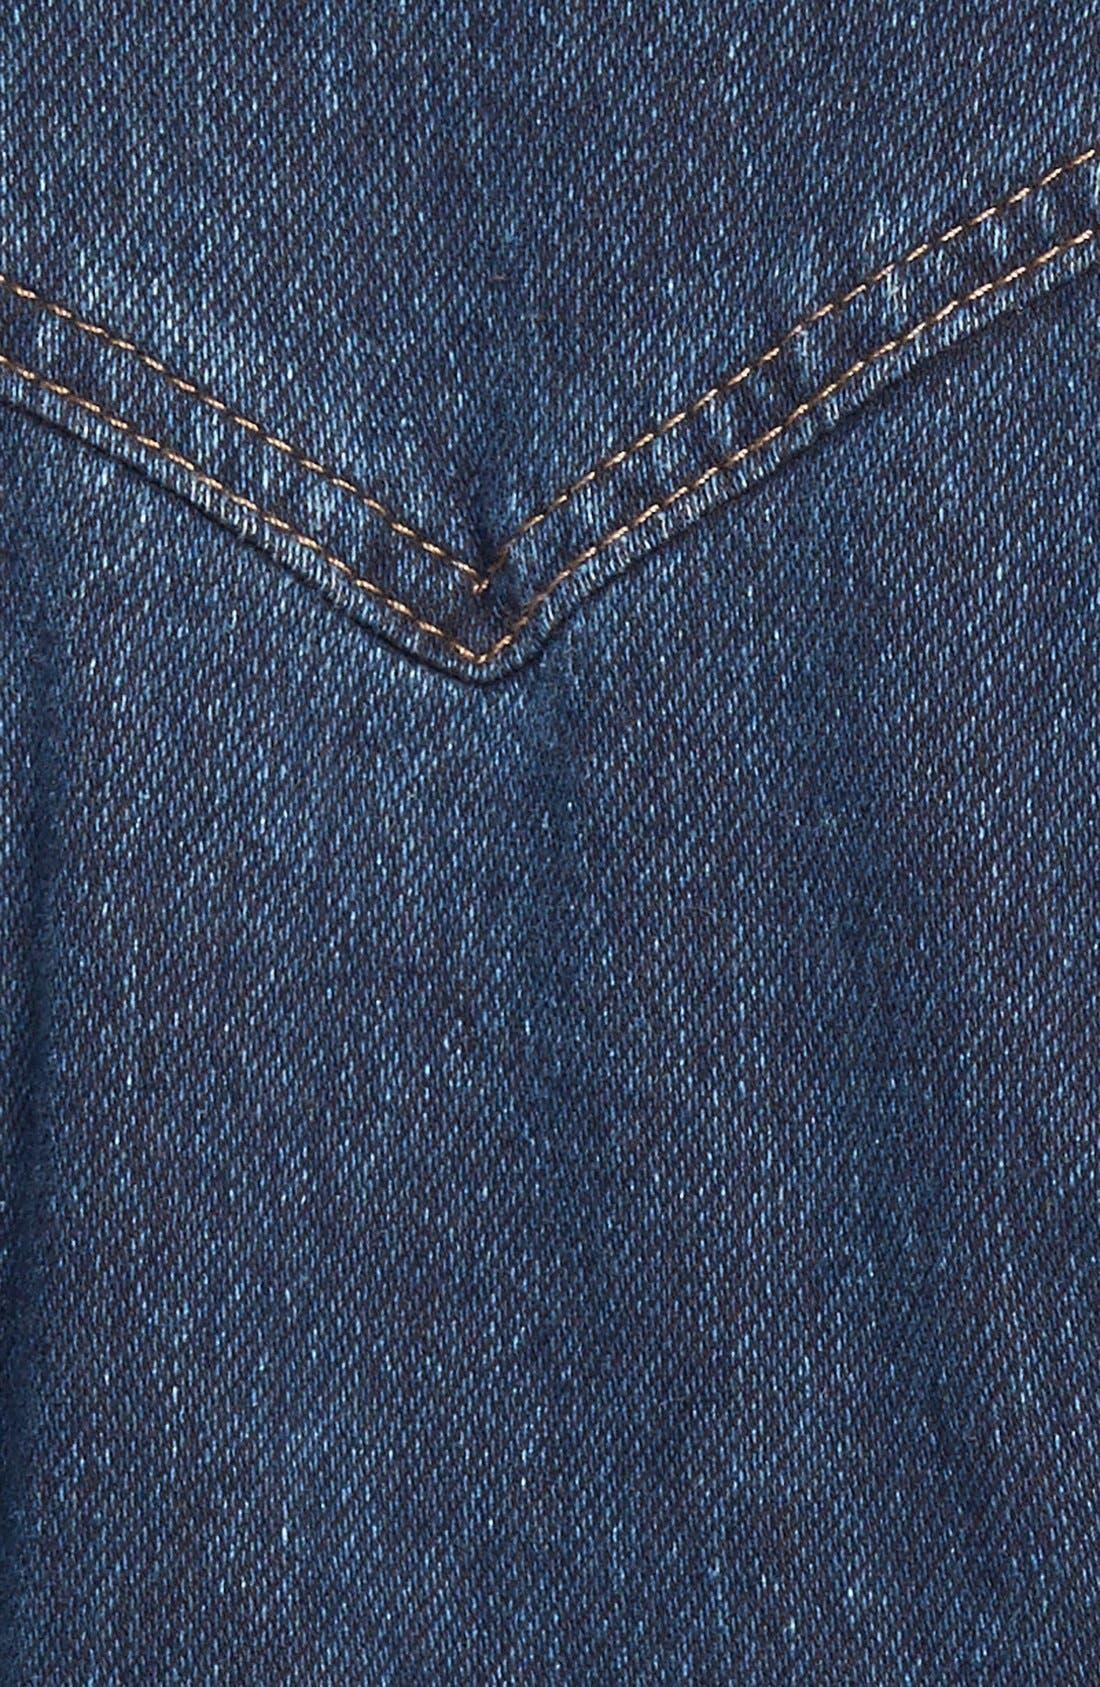 Alternate Image 3  - Jessica Simpson 'Pixie' Denim Jacket (Plus Size)